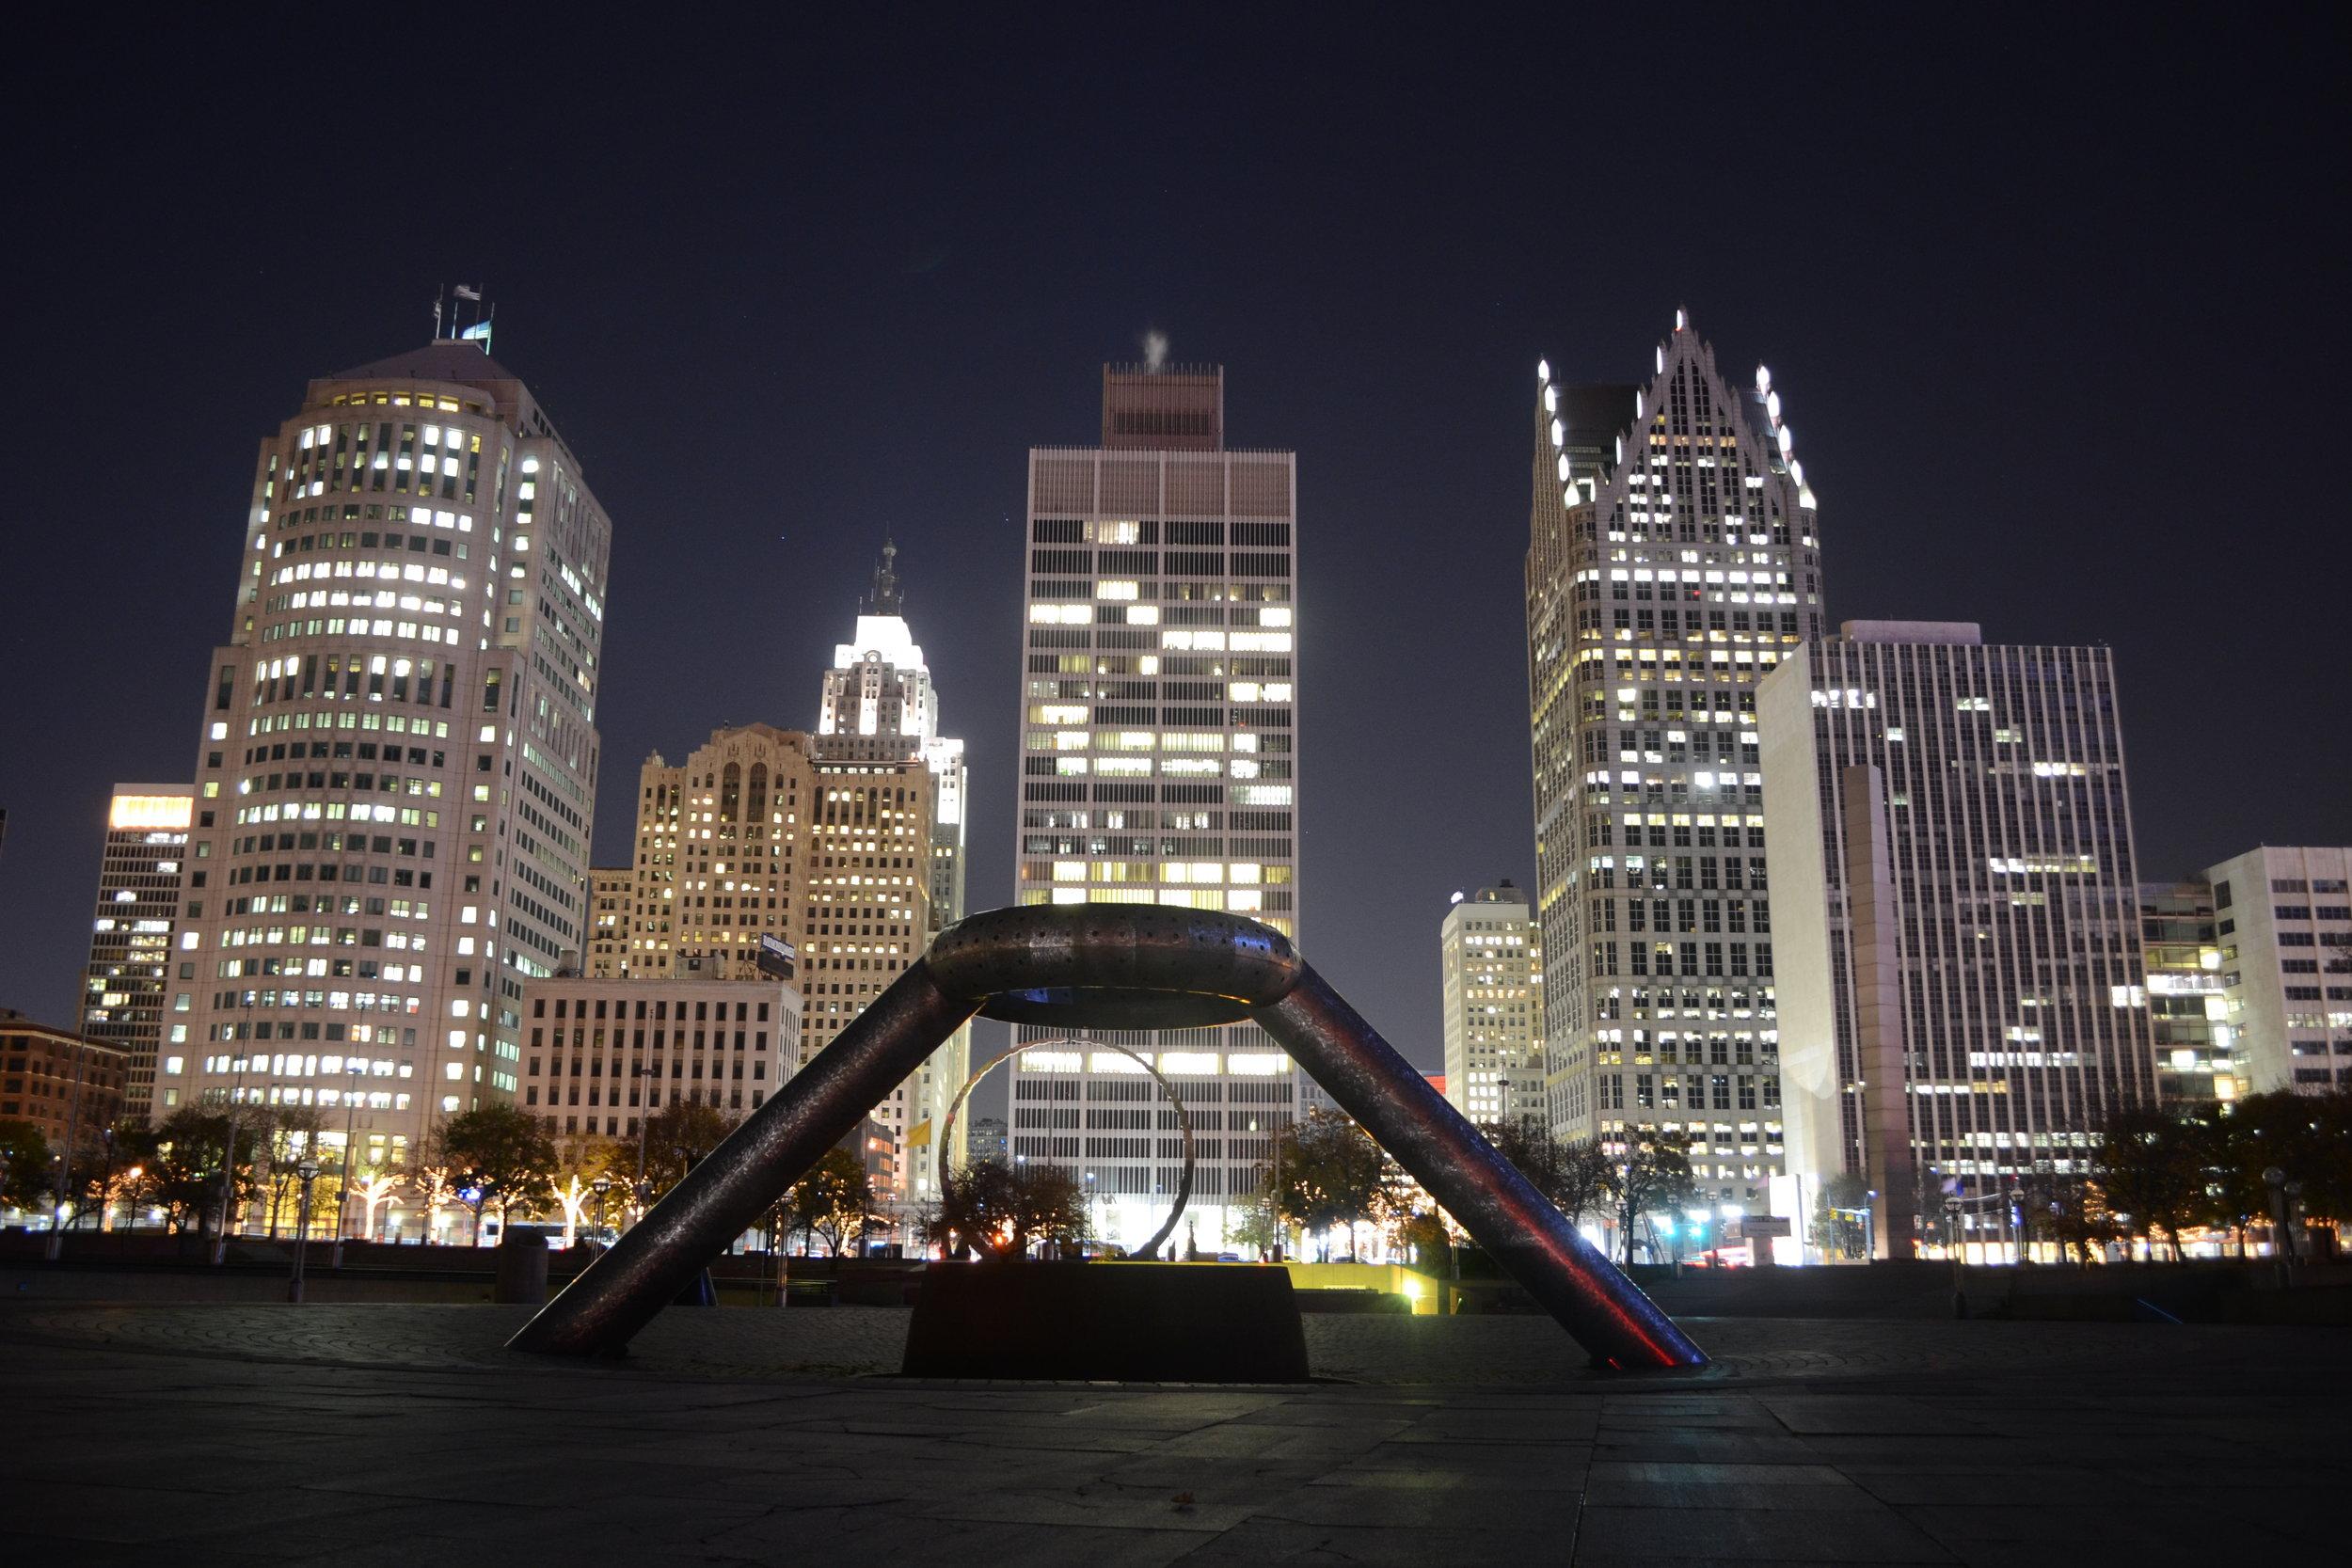 Nov. 7, 2012